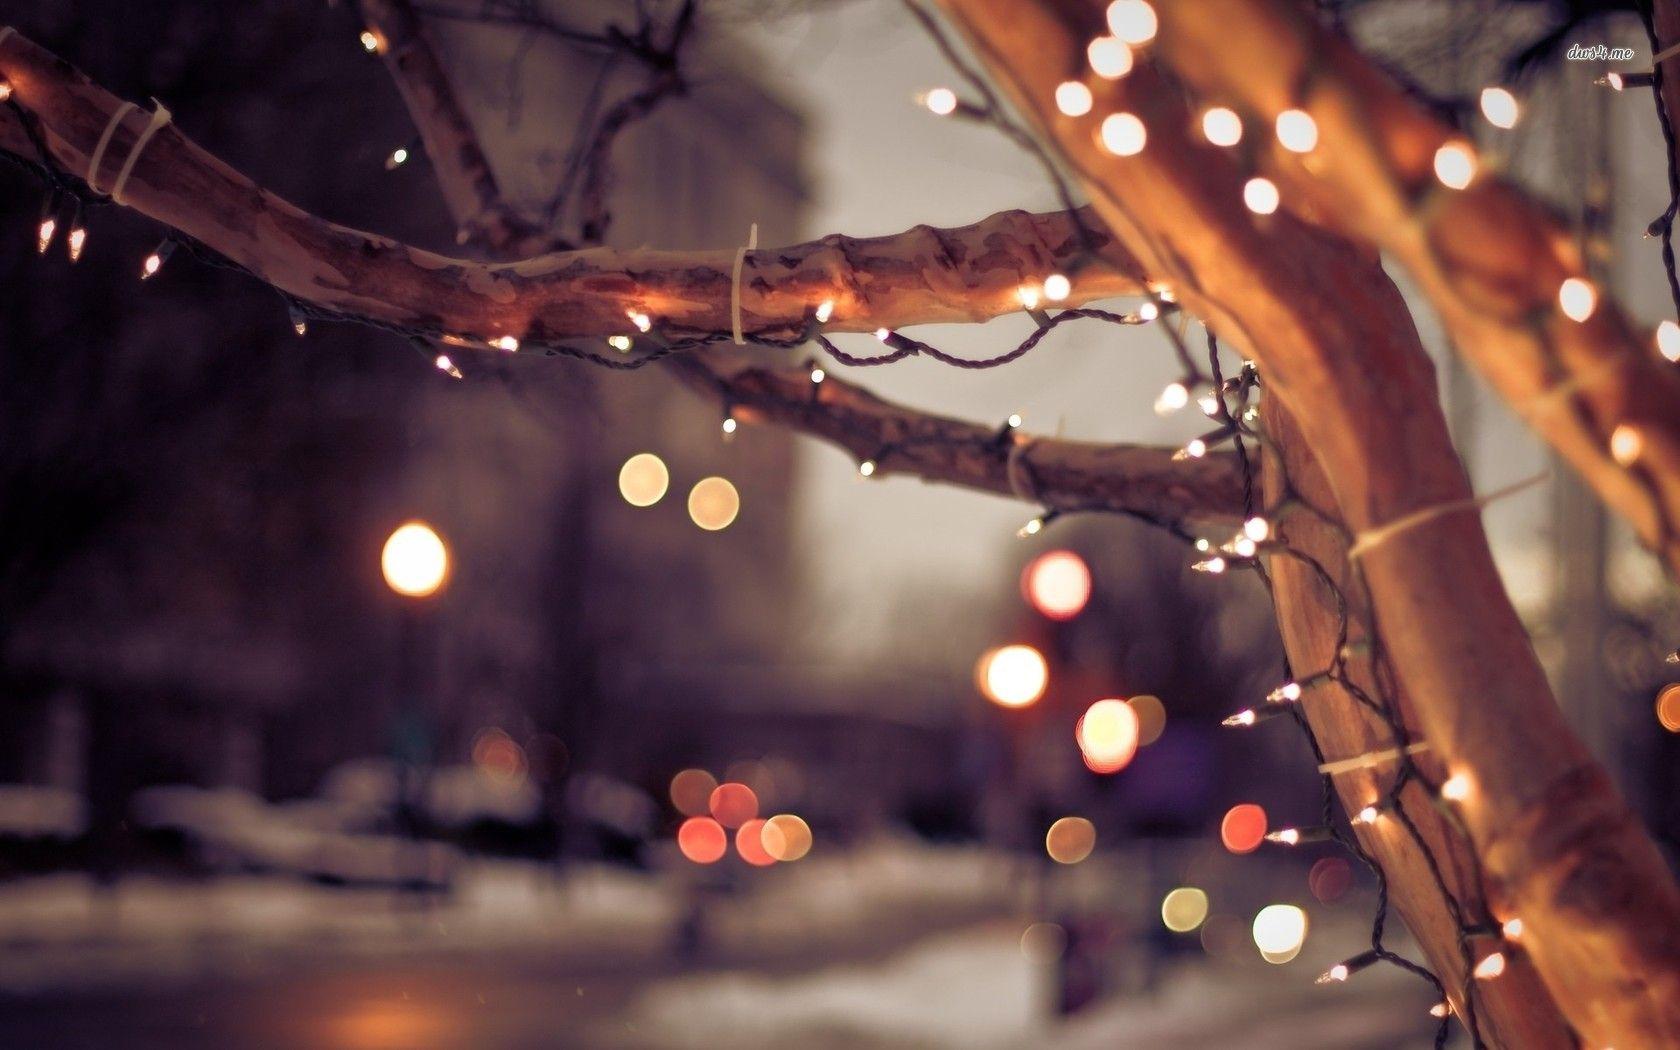 Christmas Lights On The Street Hd Wallpaper Christmas Light Photography Christmas Wallpaper Hd Christmas Lights Background